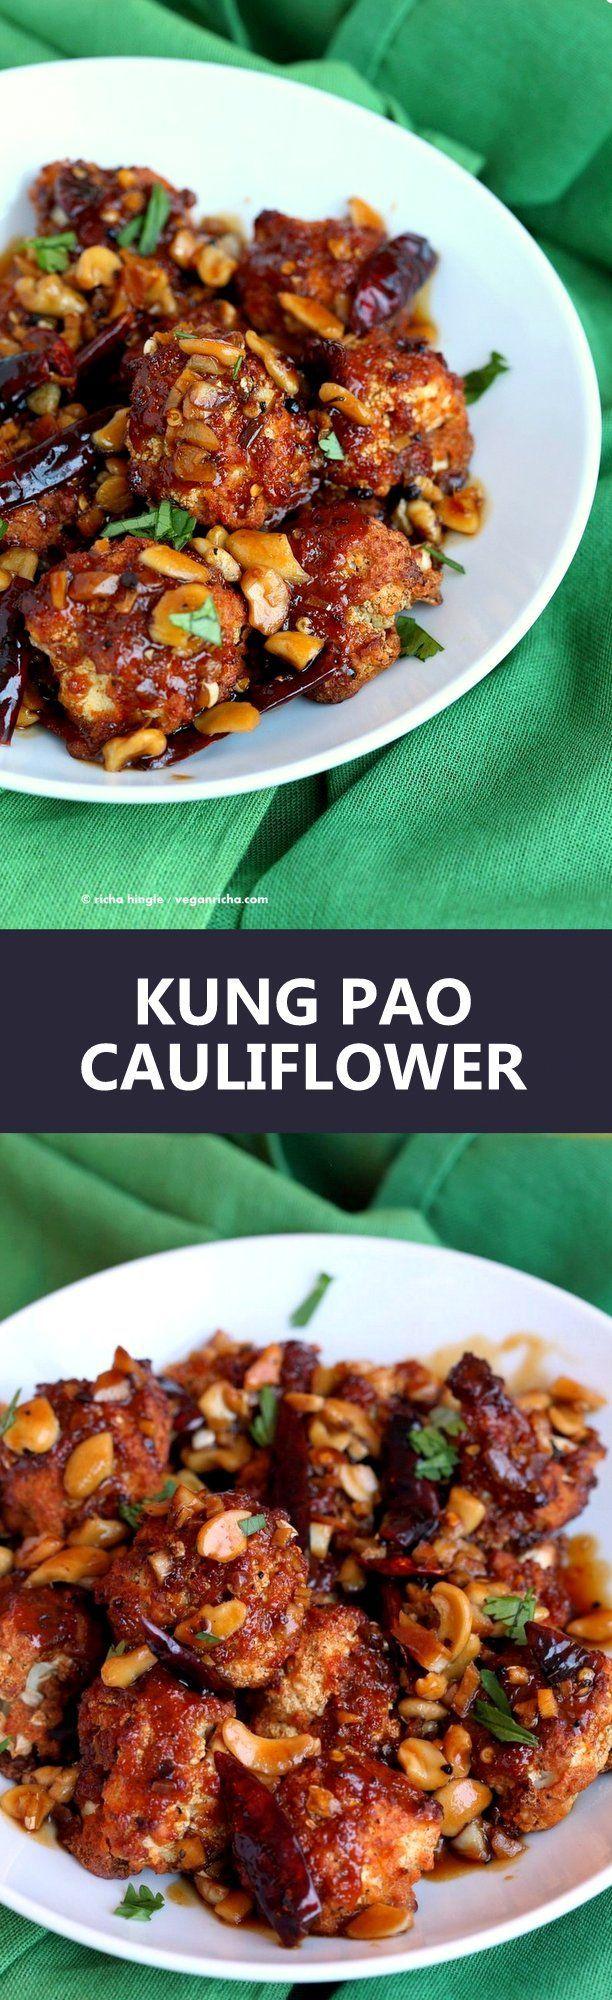 Spicy Crispy Kung Pao Cauliflower. Cauliflower battered and baked and tossed in spicy kung pao sauce. | http://VeganRicha.com vegan appetizer snack cauliflower kungpao recipe